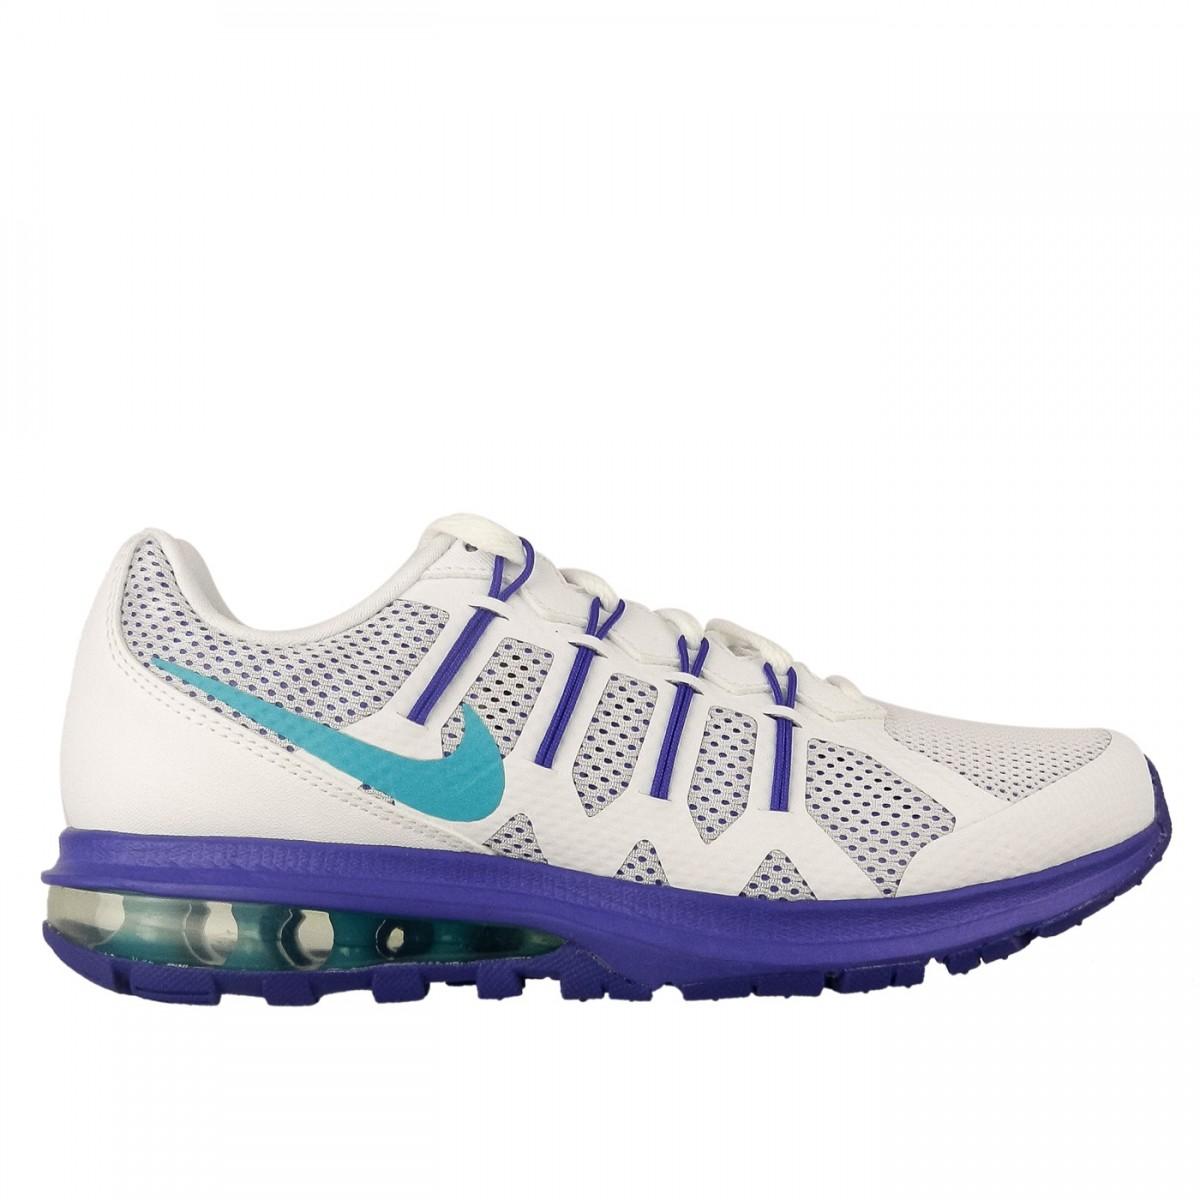 Tênis Feminino Nike Air Max Dynasty Msl 819154 101